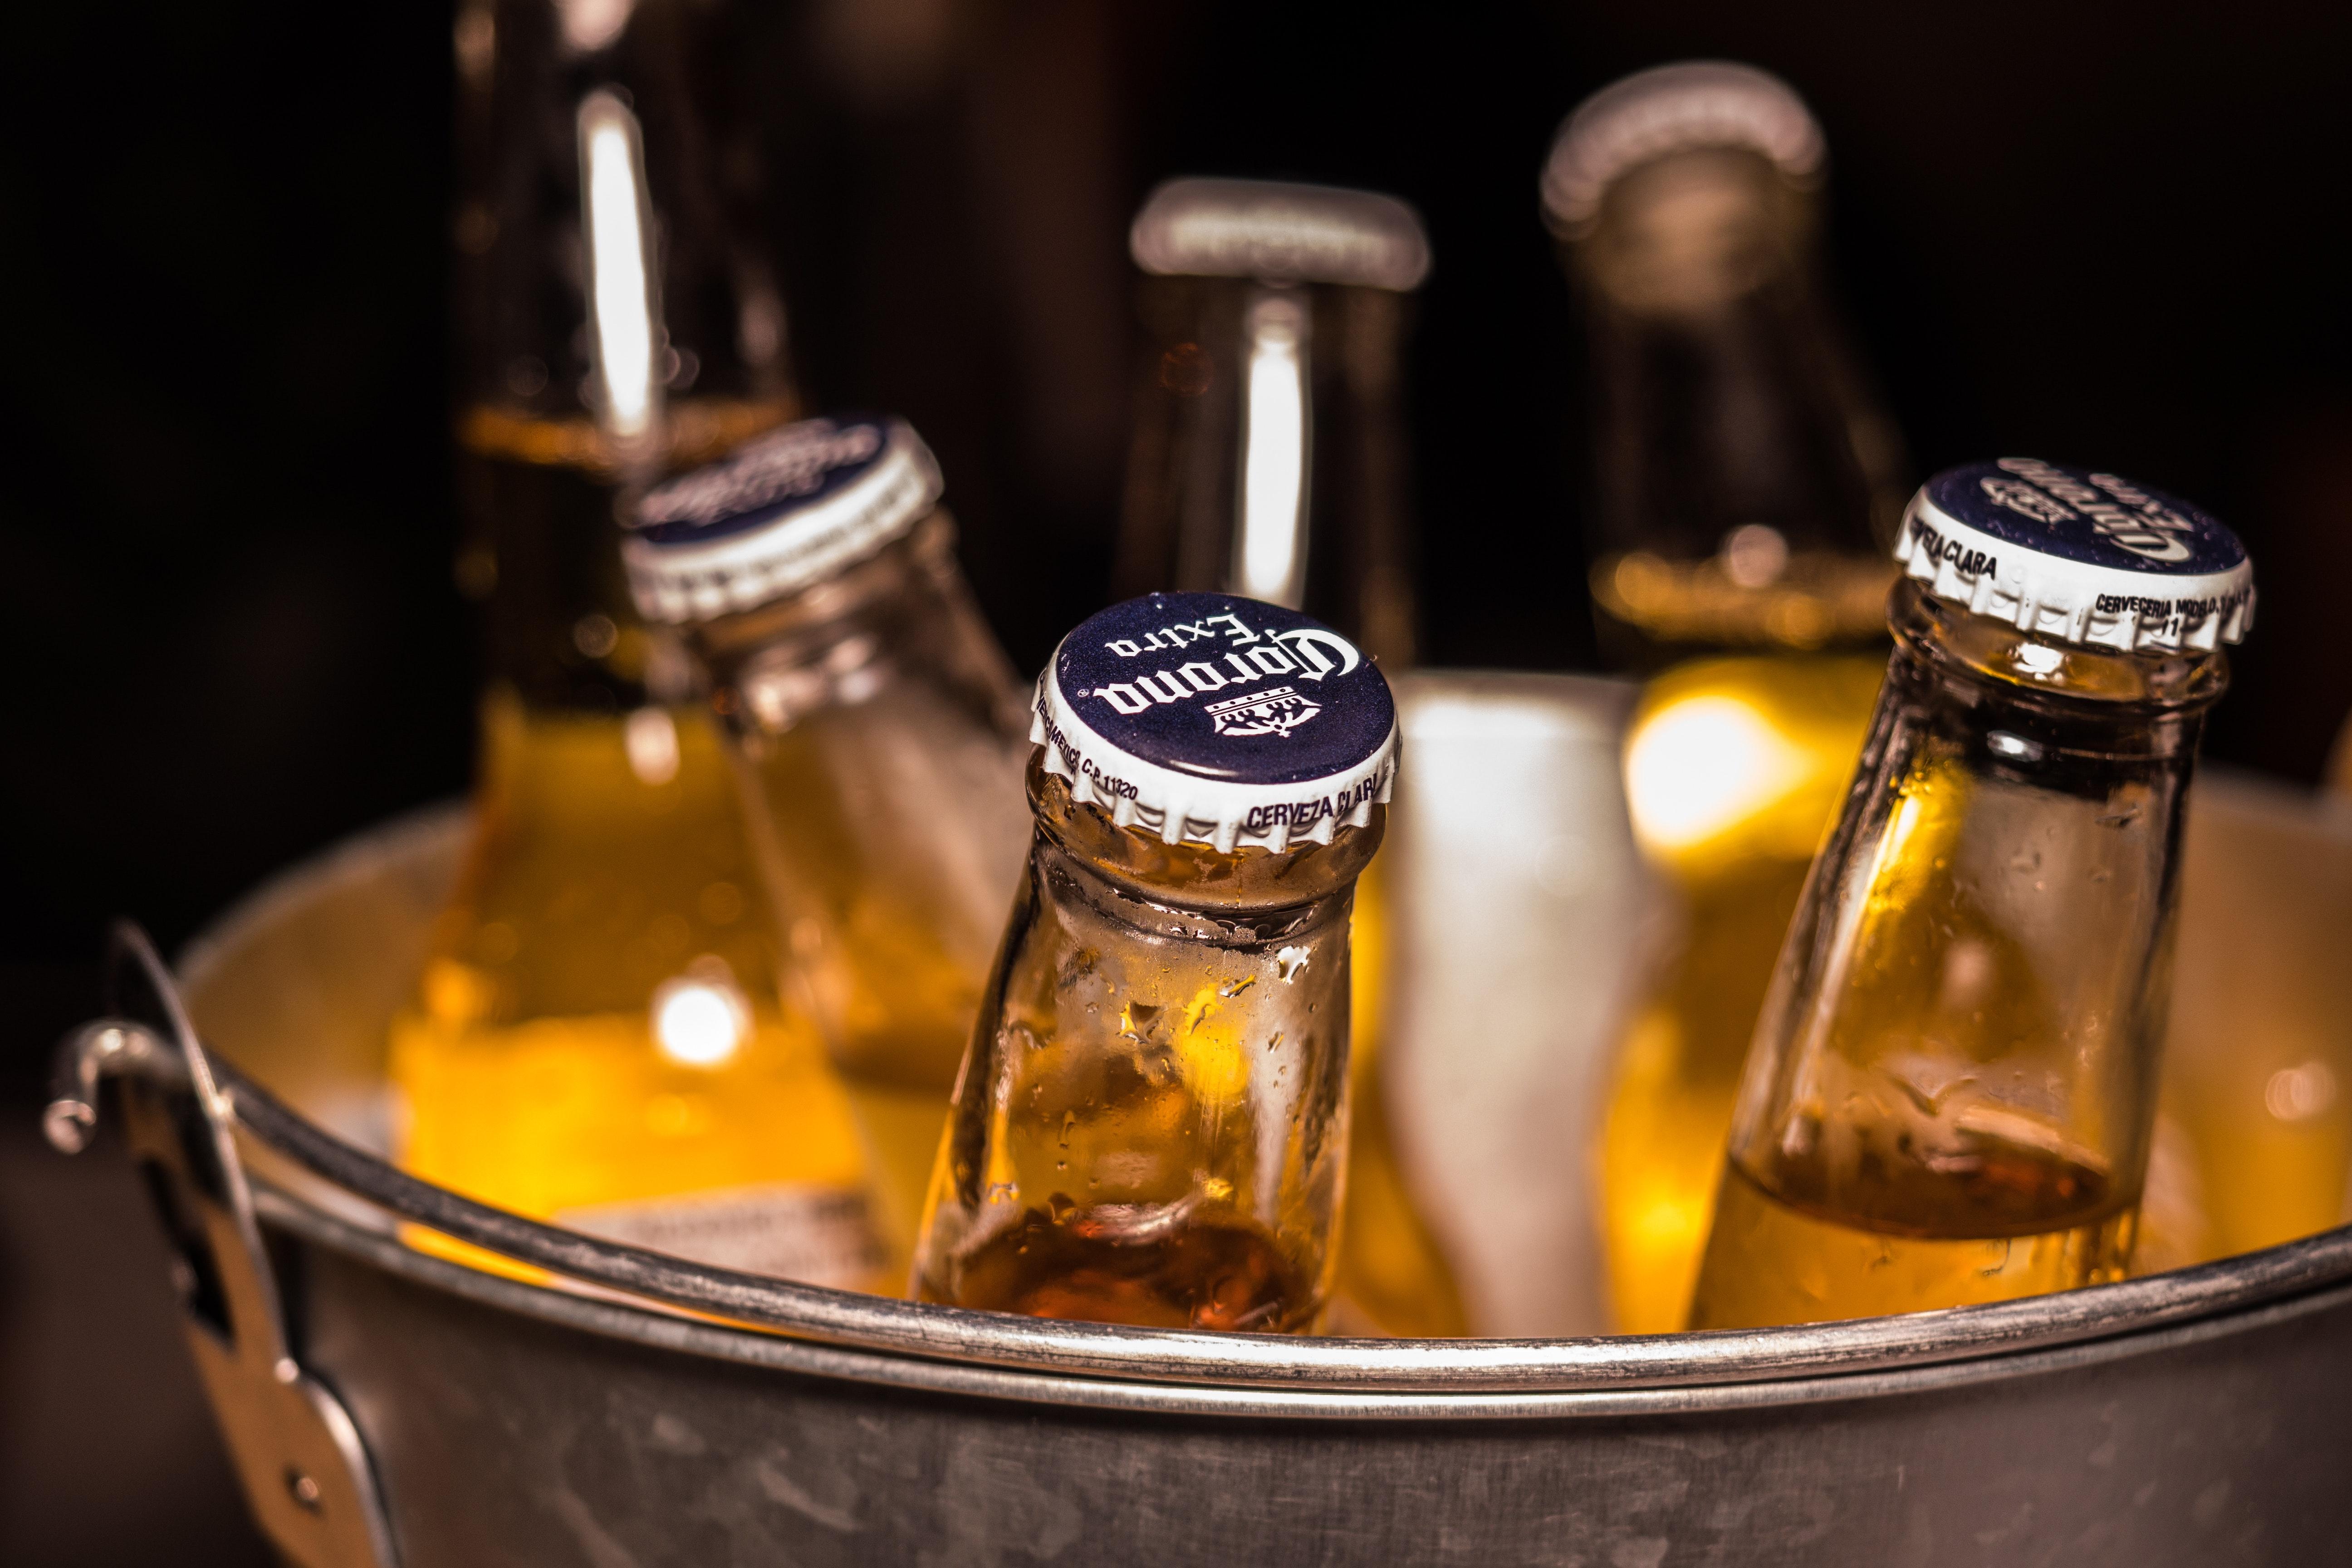 Pub Wallpaper 57 Images: 300+ Buzzing Beer Photos · Pexels · Free Stock Photos